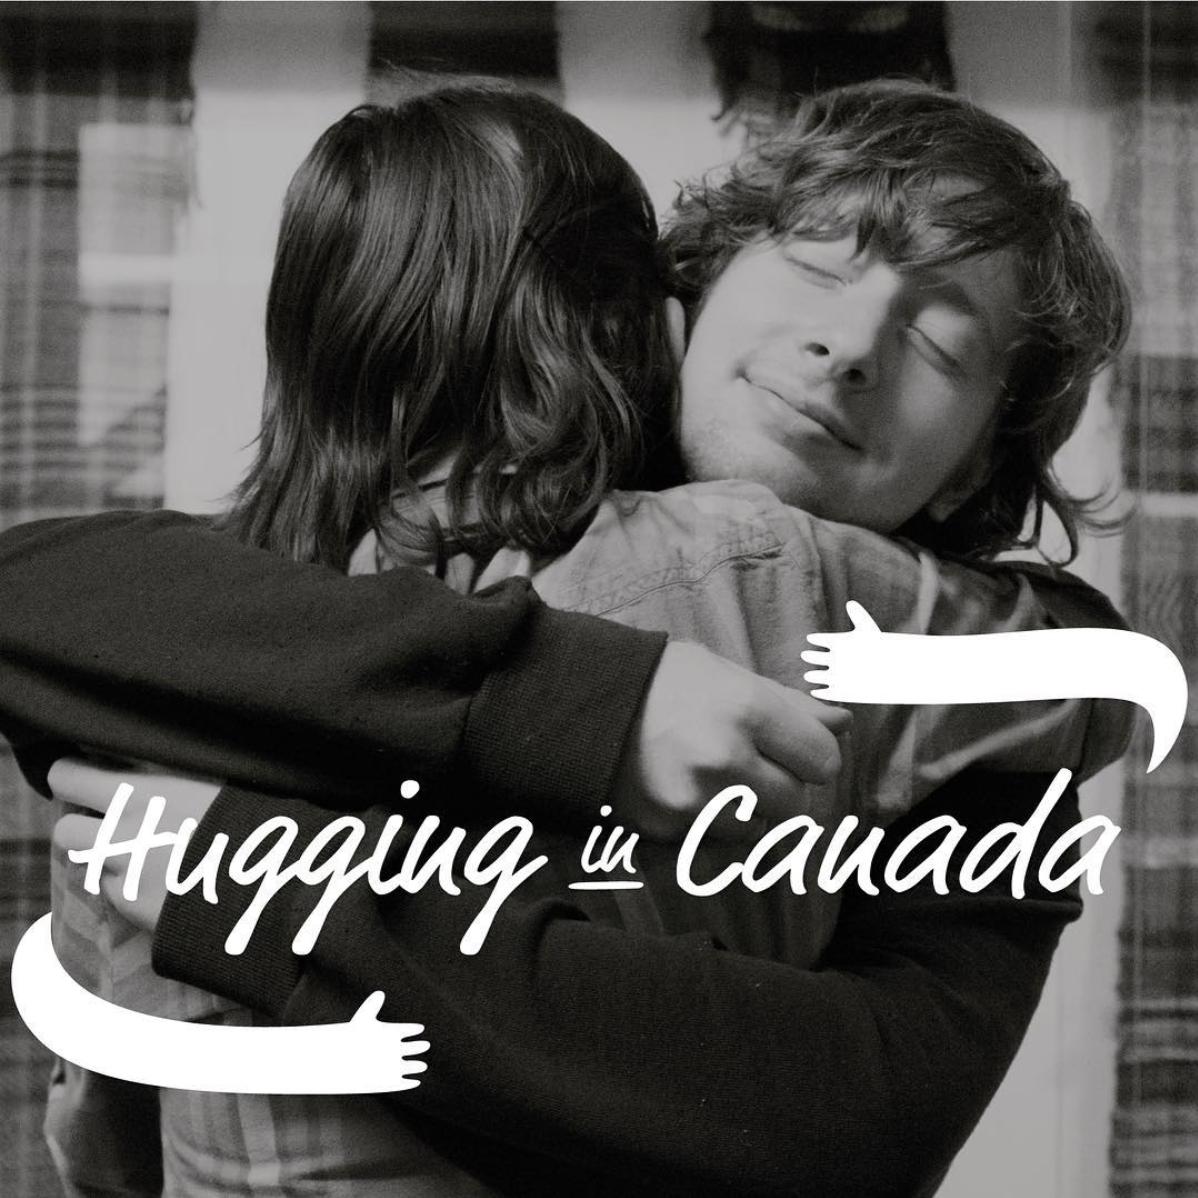 Hugging in Canada